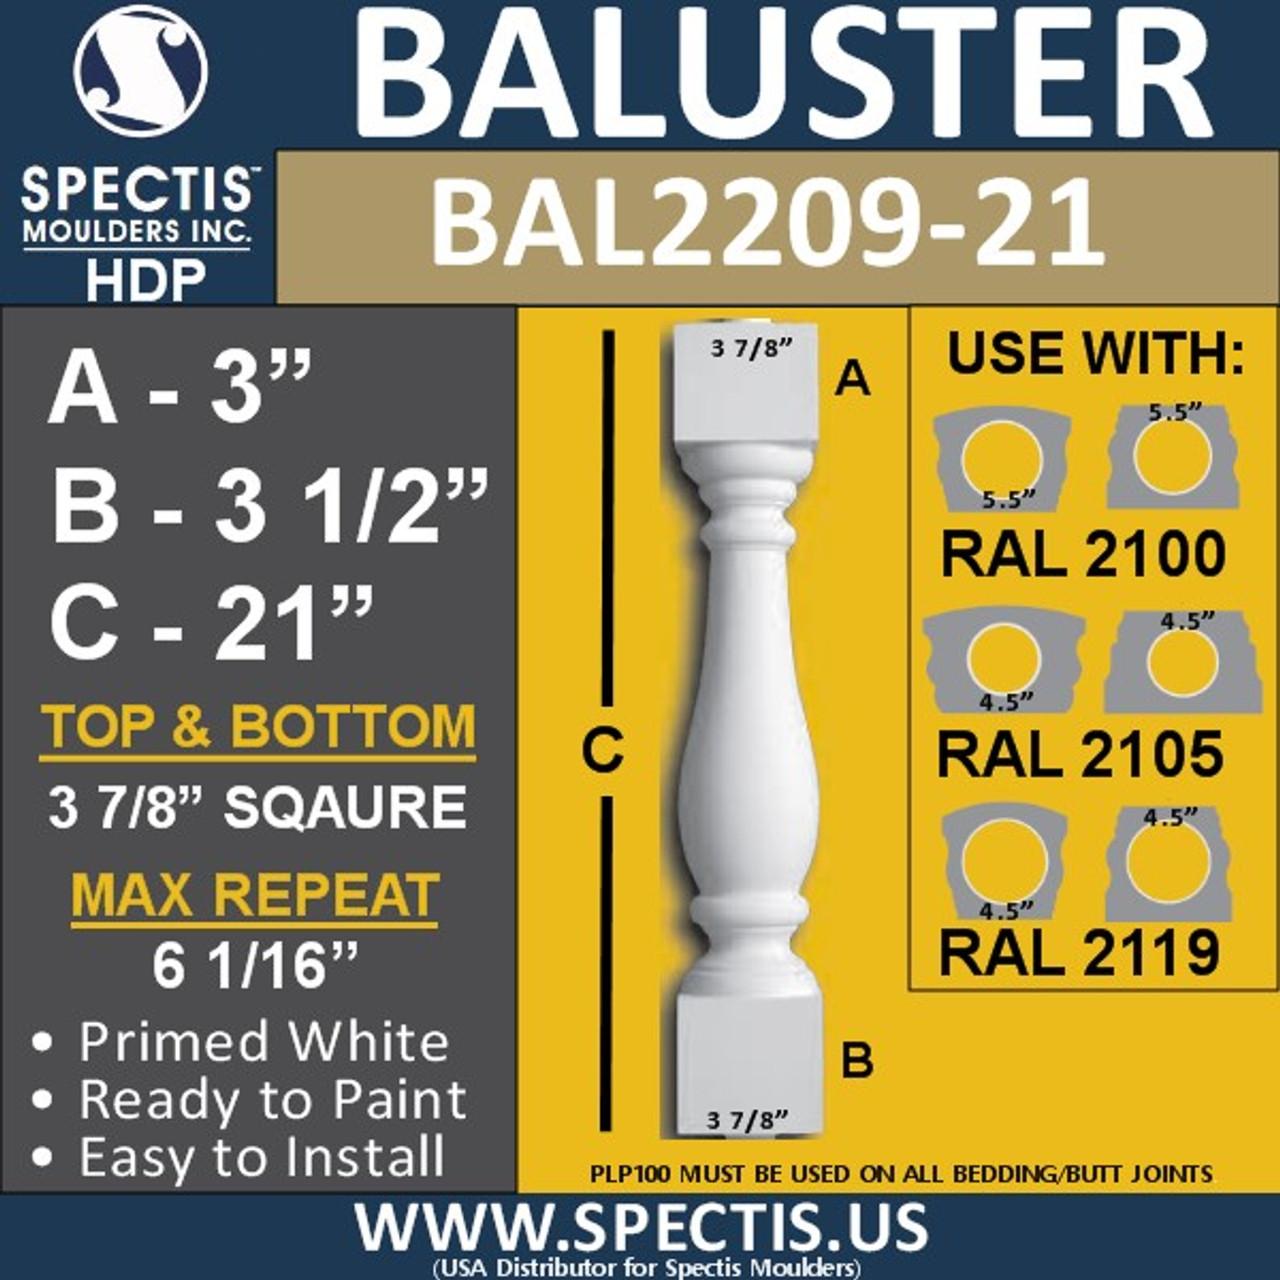 "BAL2209-21 Spectis Urethane Railing Baluster 3 7/8"" x 21"""